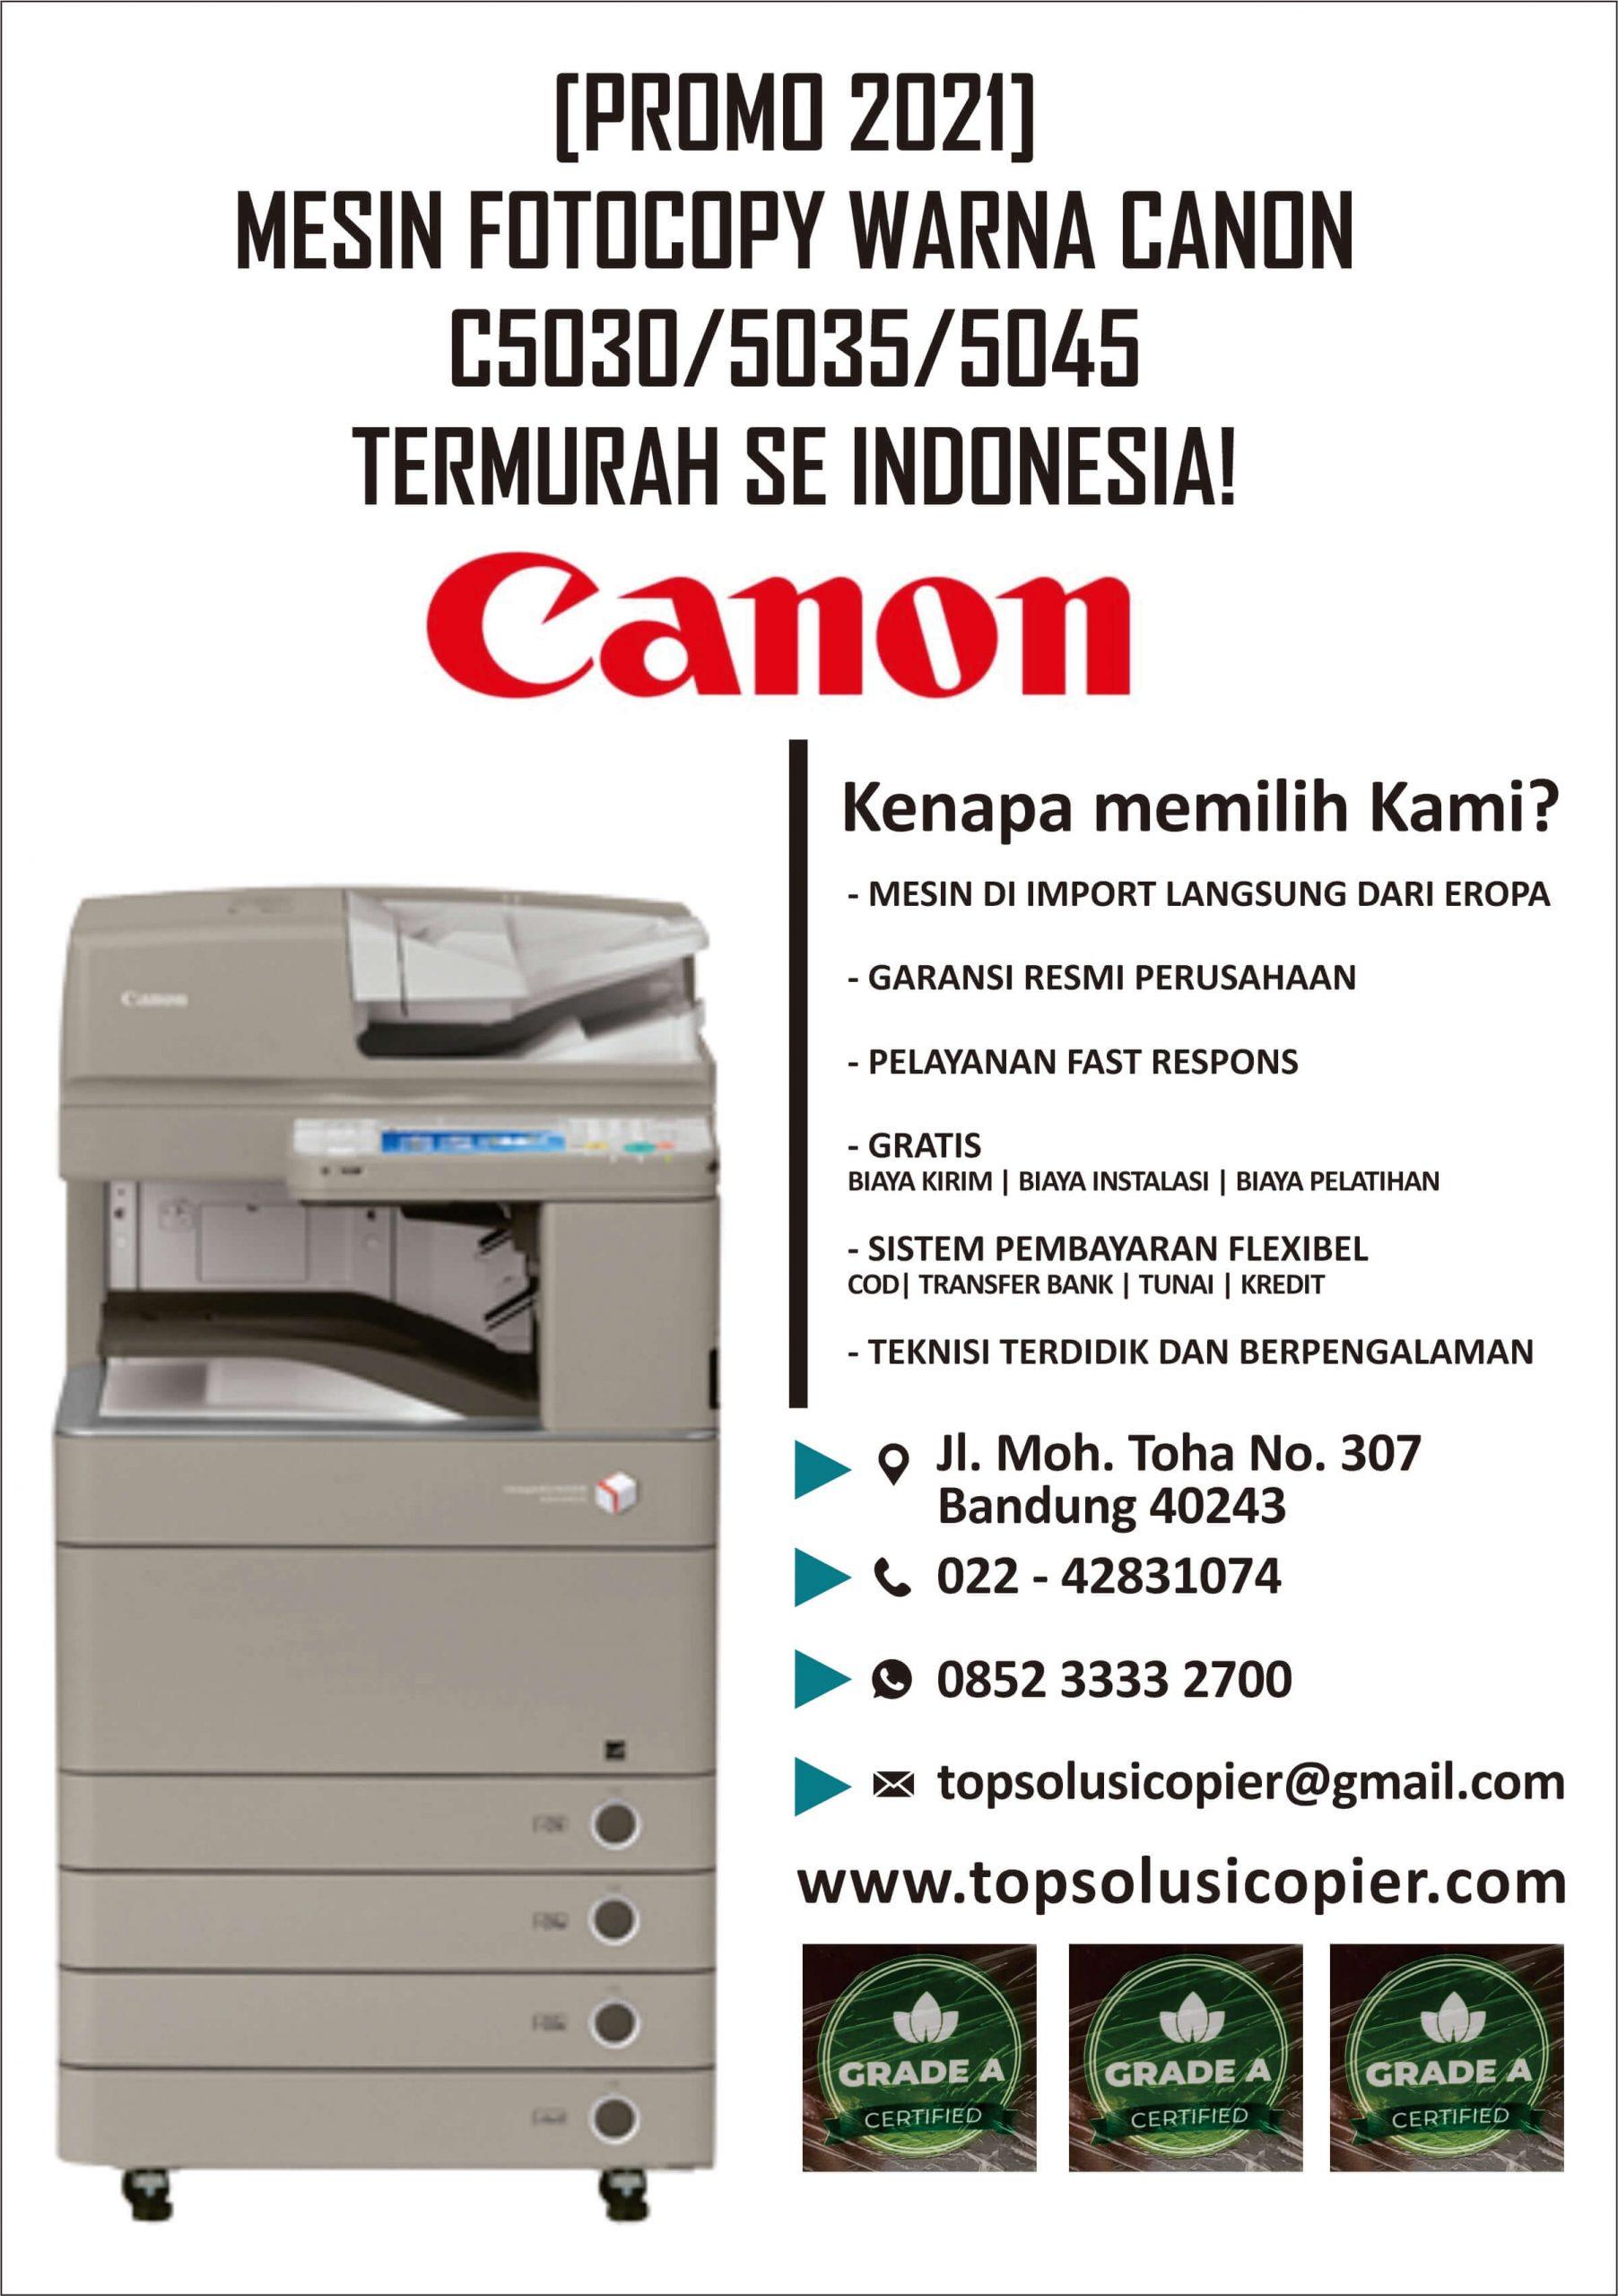 mesin fotocopy warna canon cianjur